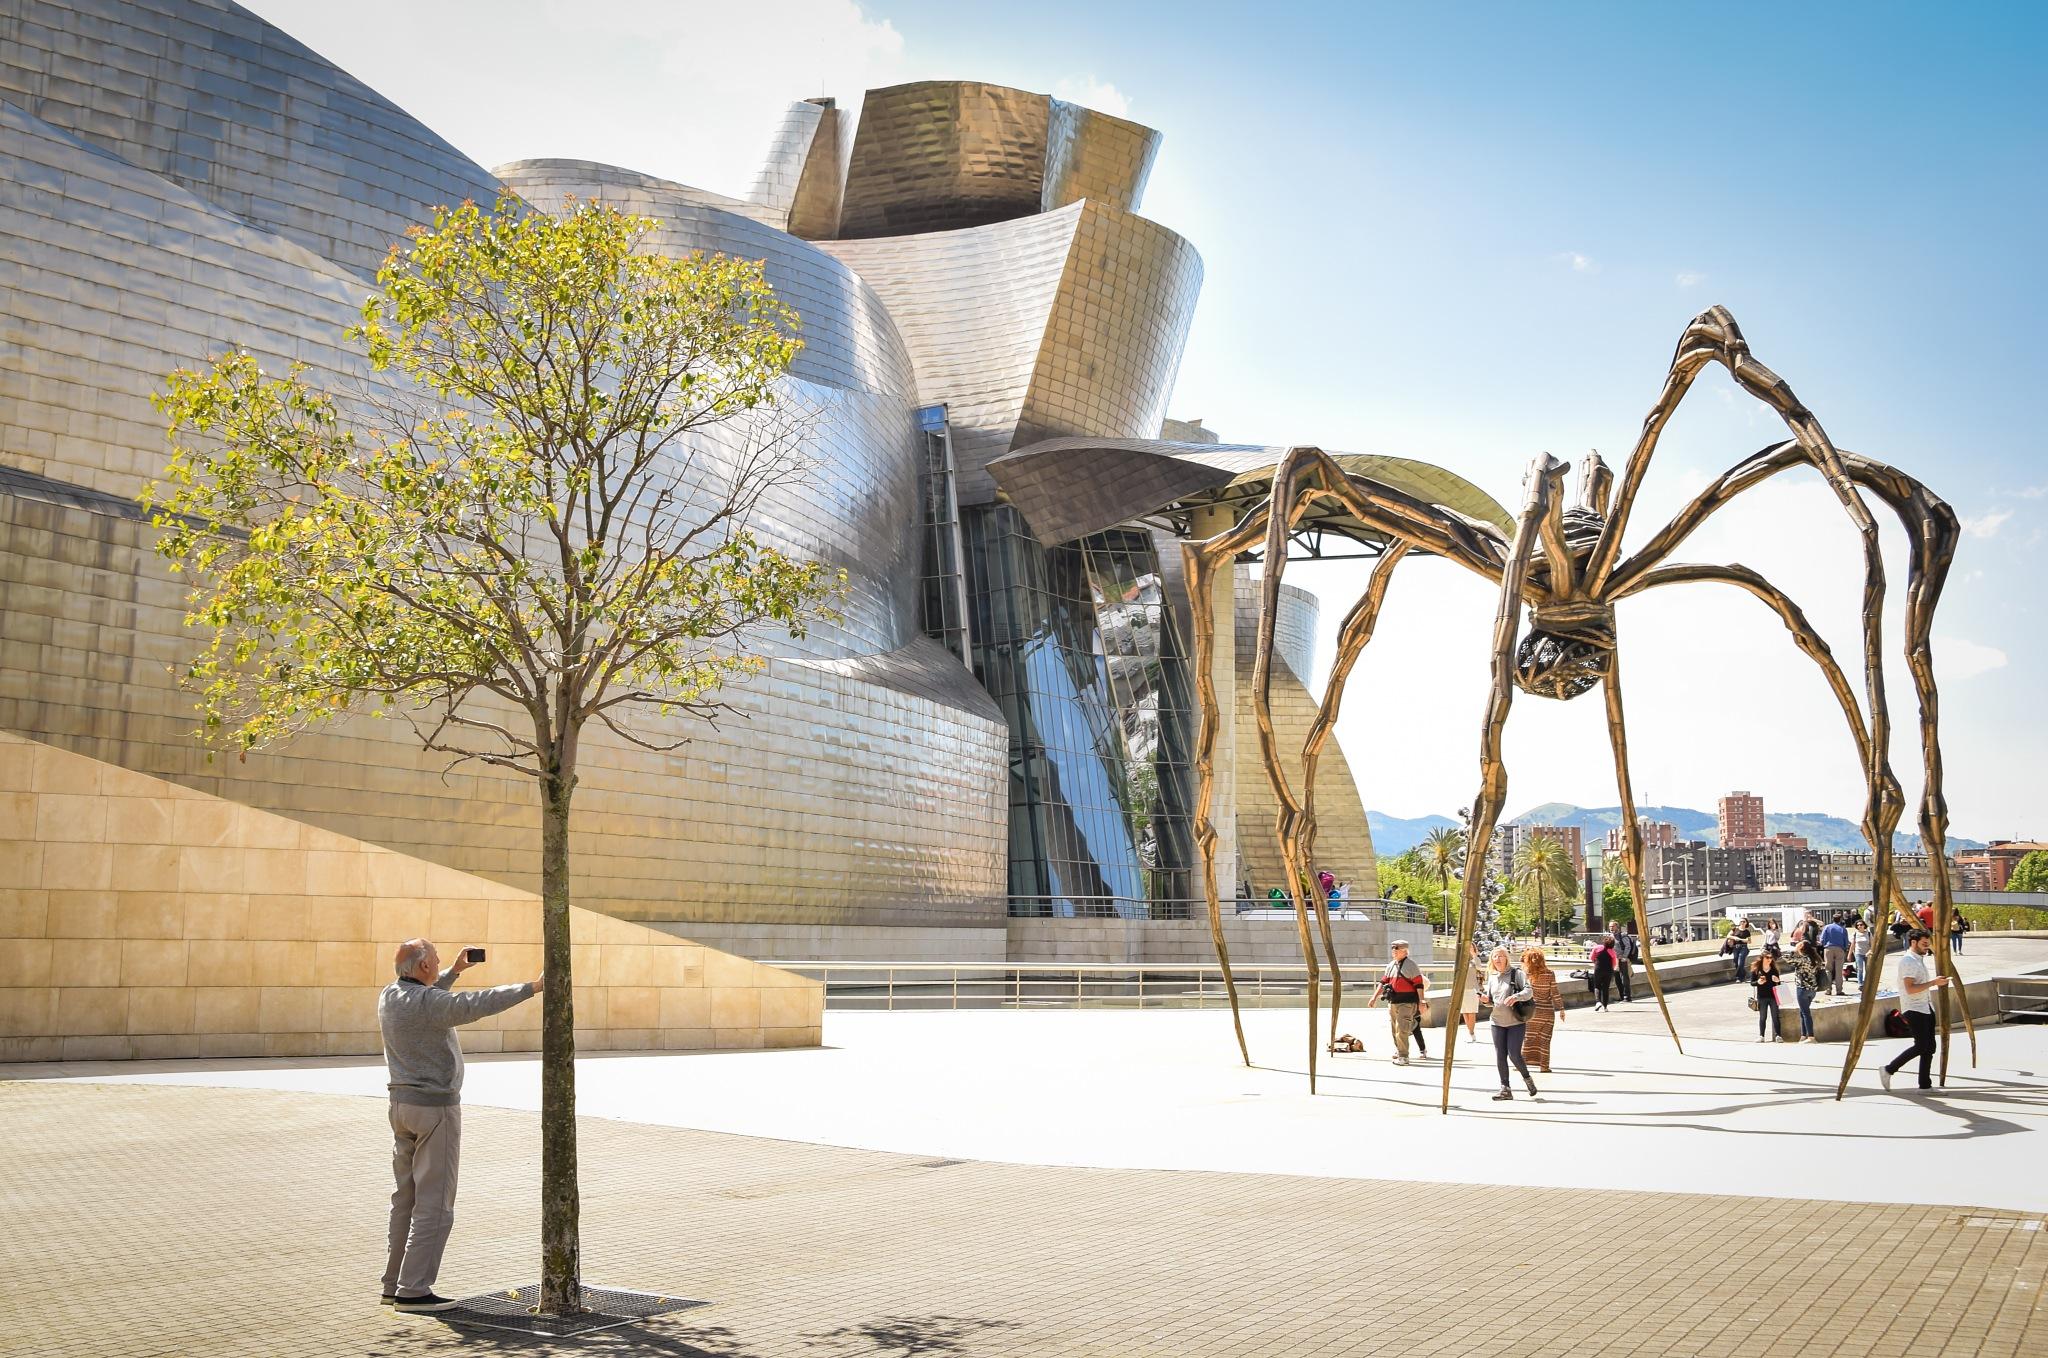 Guggenheim museum, Bilbao,Spain by Marius Rusu